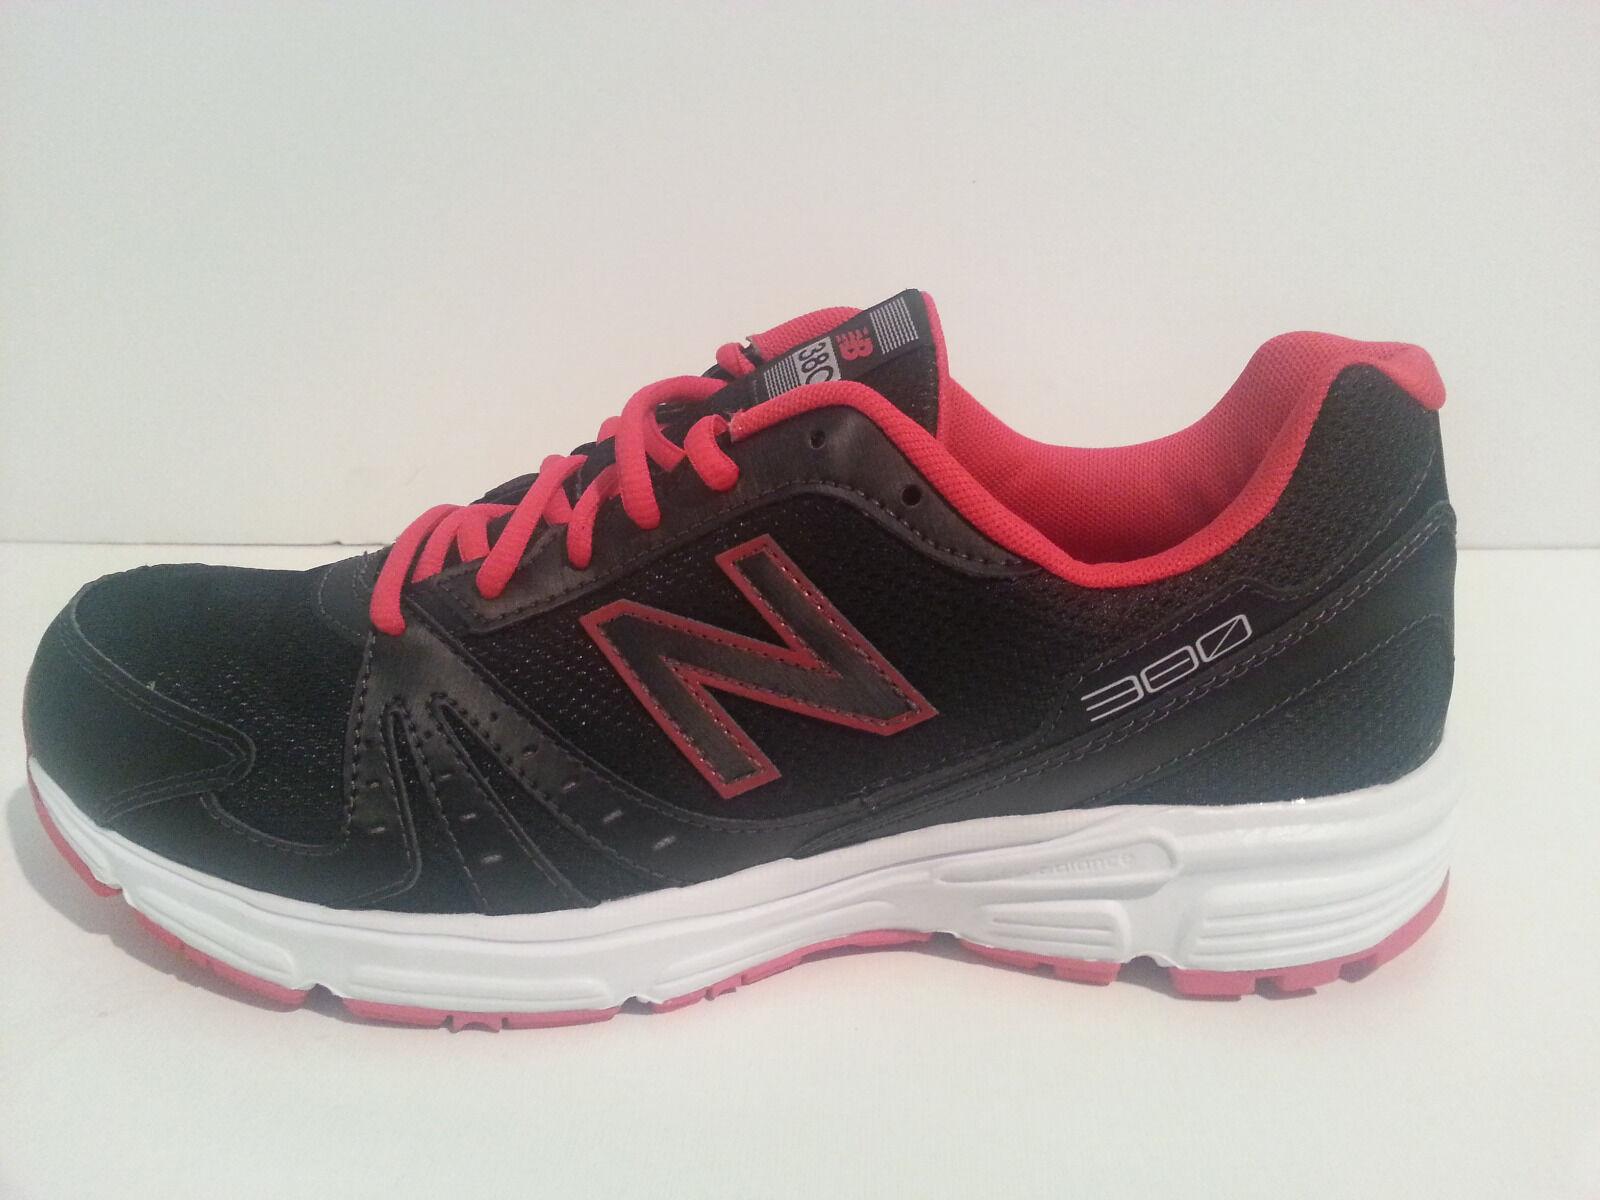 New balance M380BW2 Men's Sneakers  Black Shoes   Sz 10